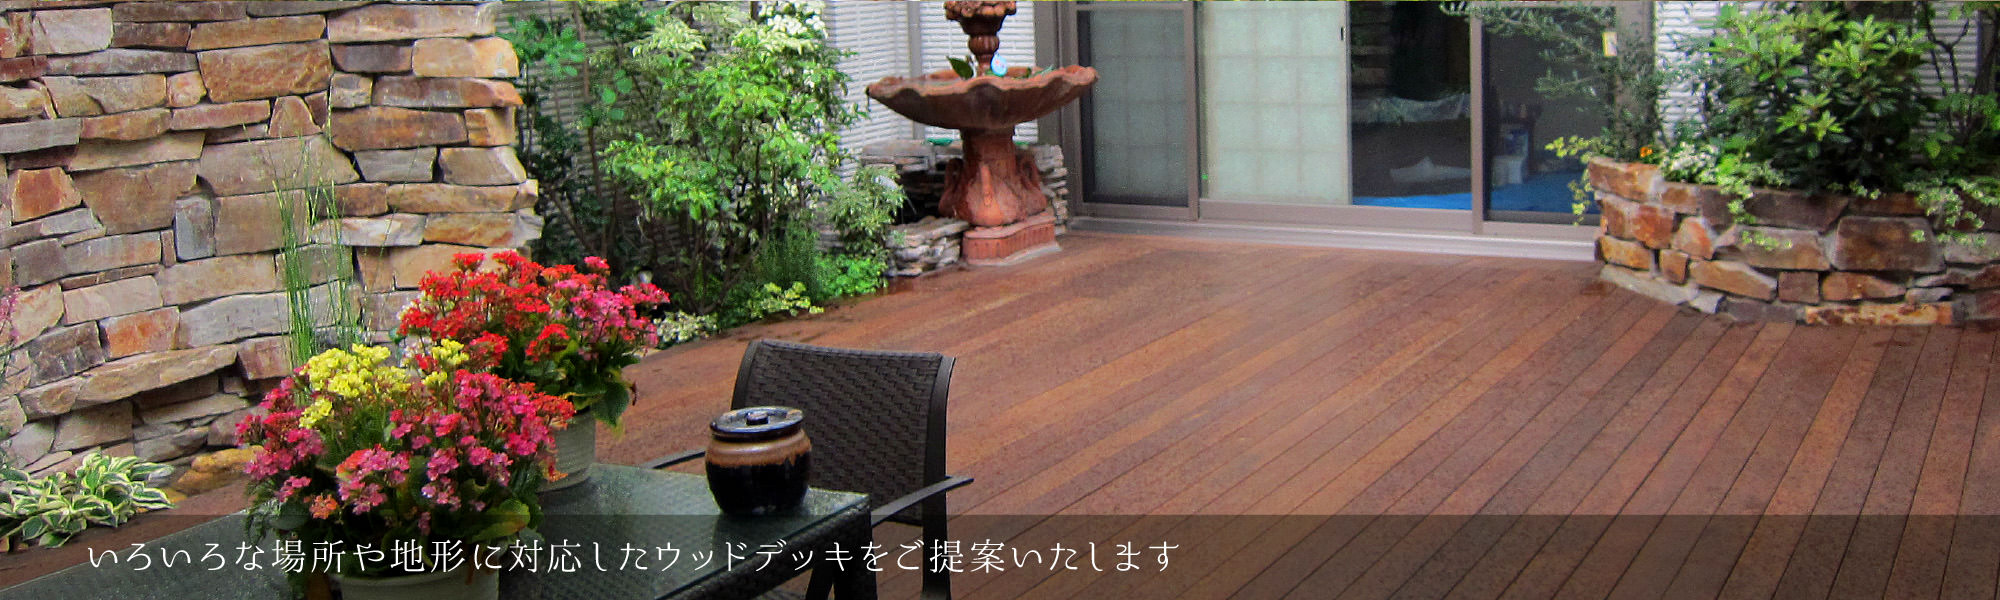 <a href='http://yakigaya-zouen.com/archives/669'></a>